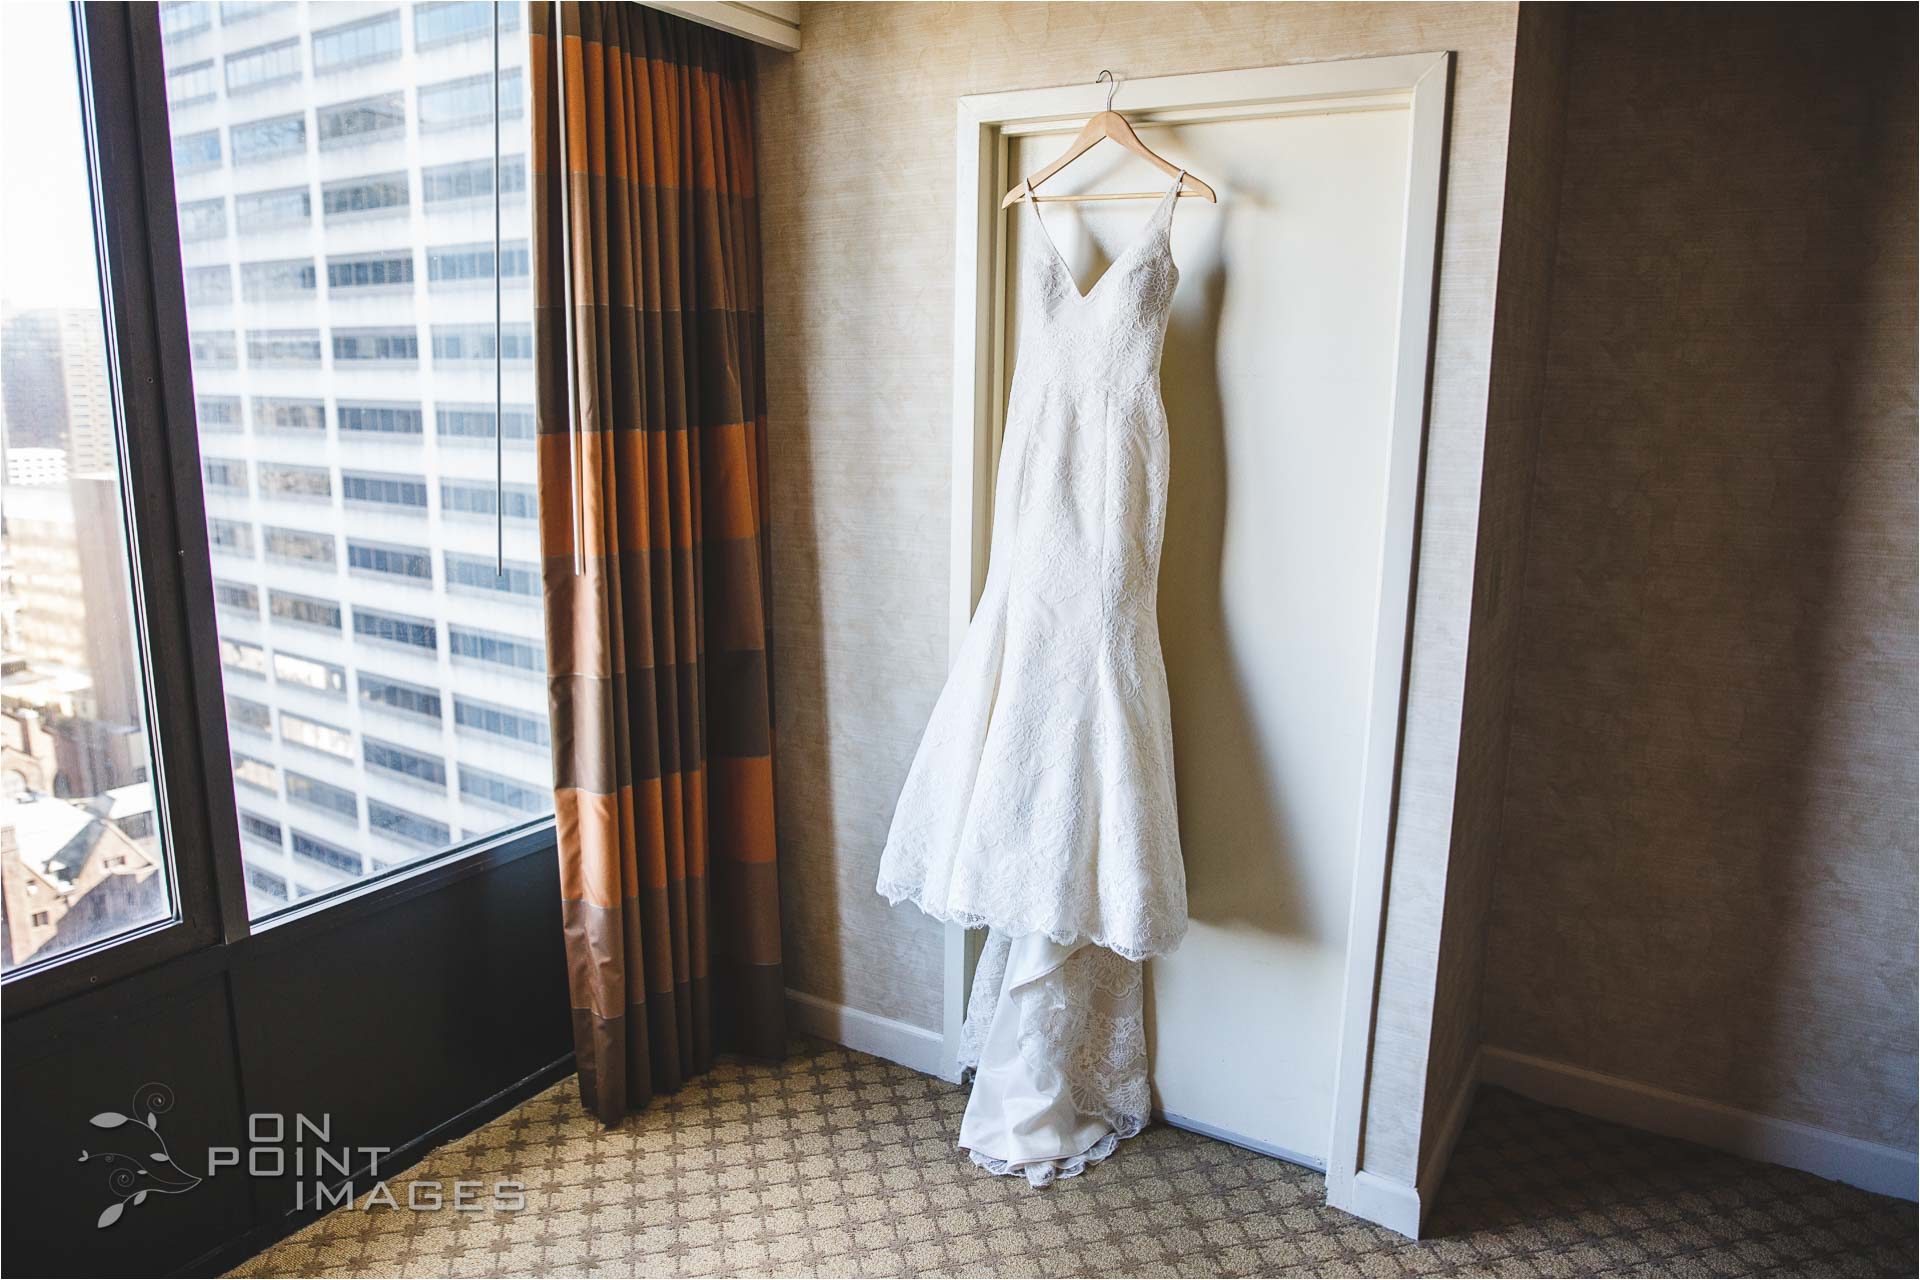 marquee-events-wedding-hartford-ct-02.jpg